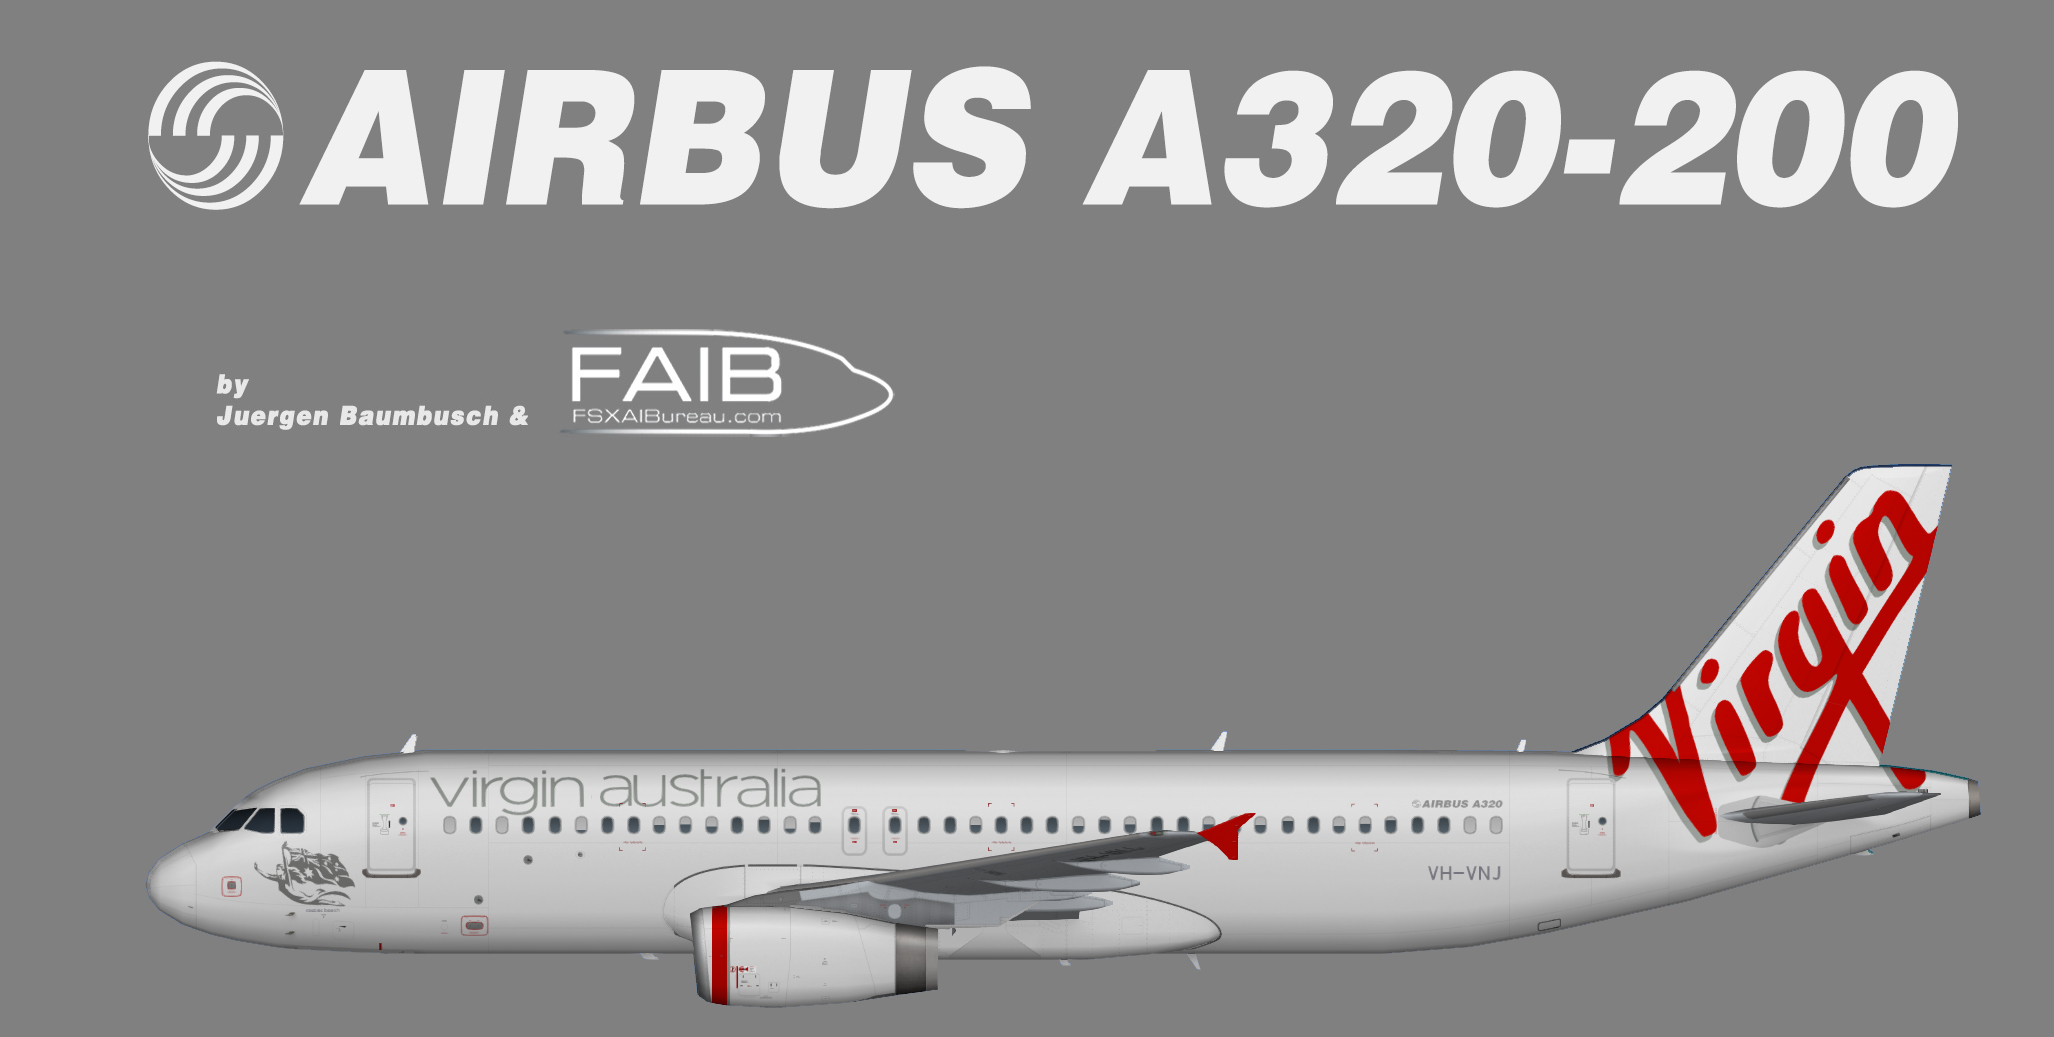 Virgin Australia Regional Airbus A320-200